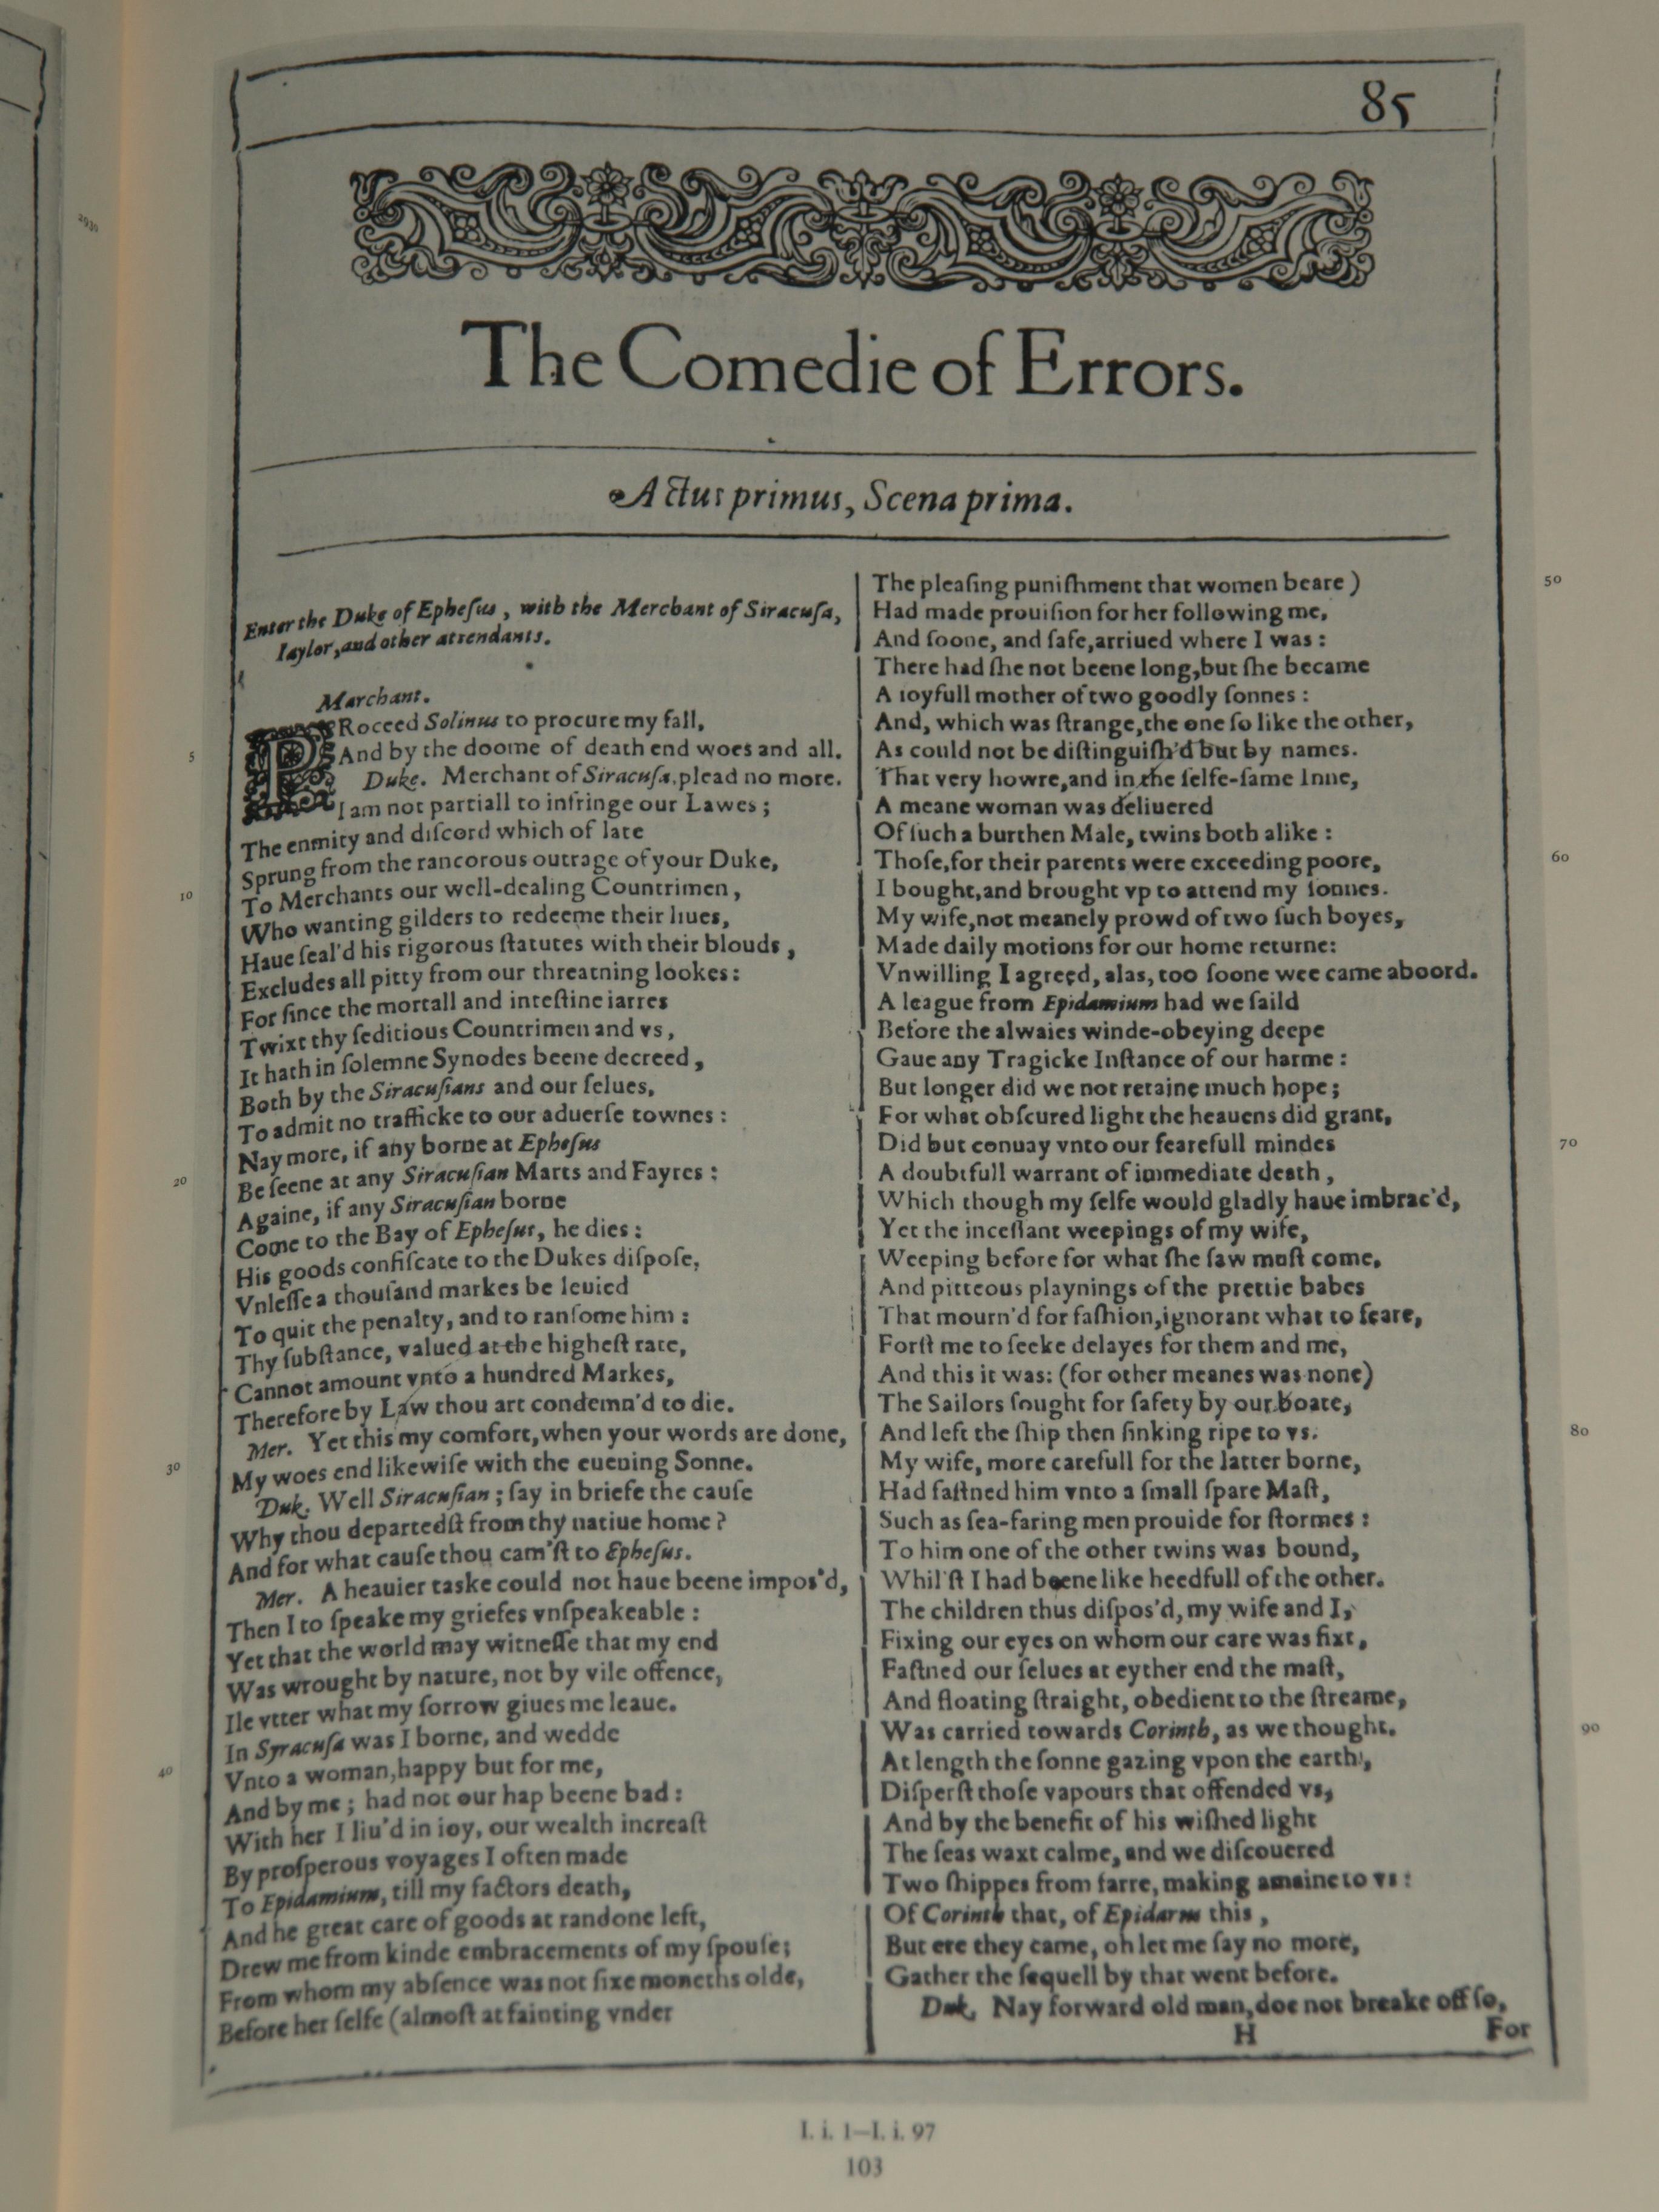 Comedy of errors essay